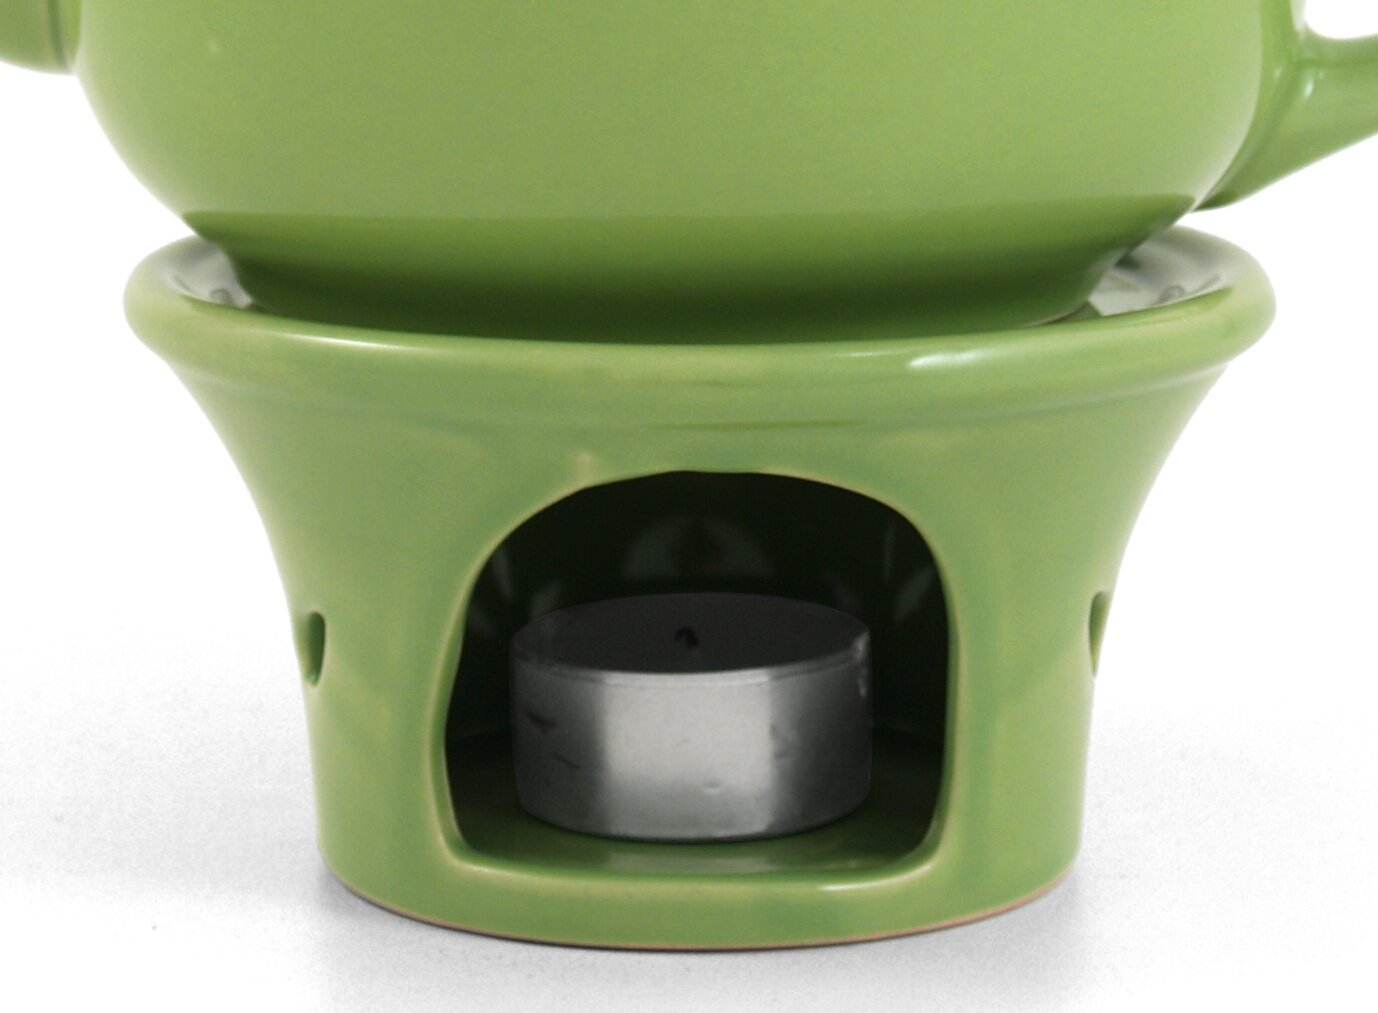 Metropolitan Tea Lime Green Ceramic Teapot Warmer